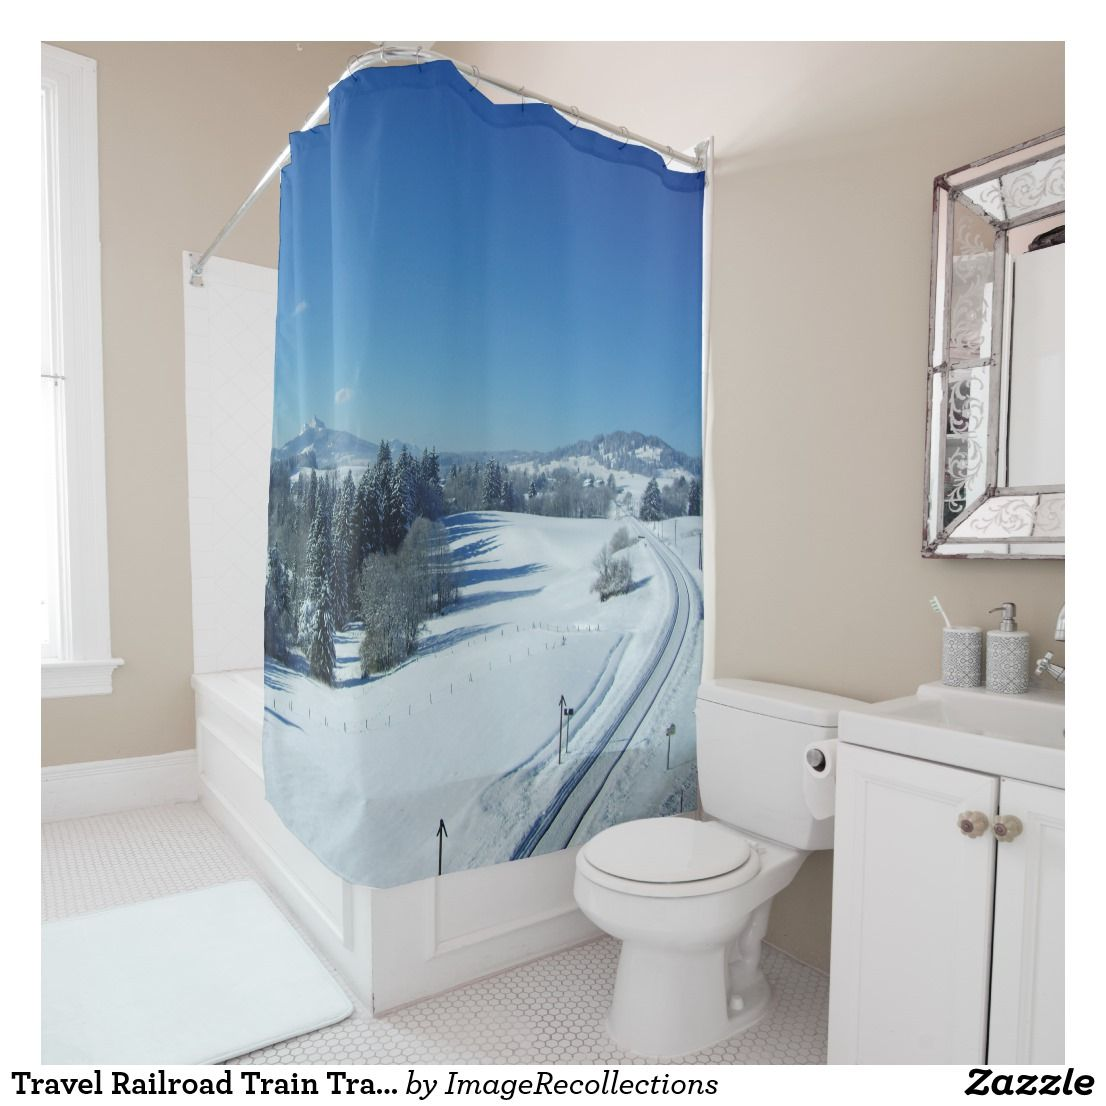 Travel Railroad Train Tracks Thru Snow Shower Curtain Zazzle Com